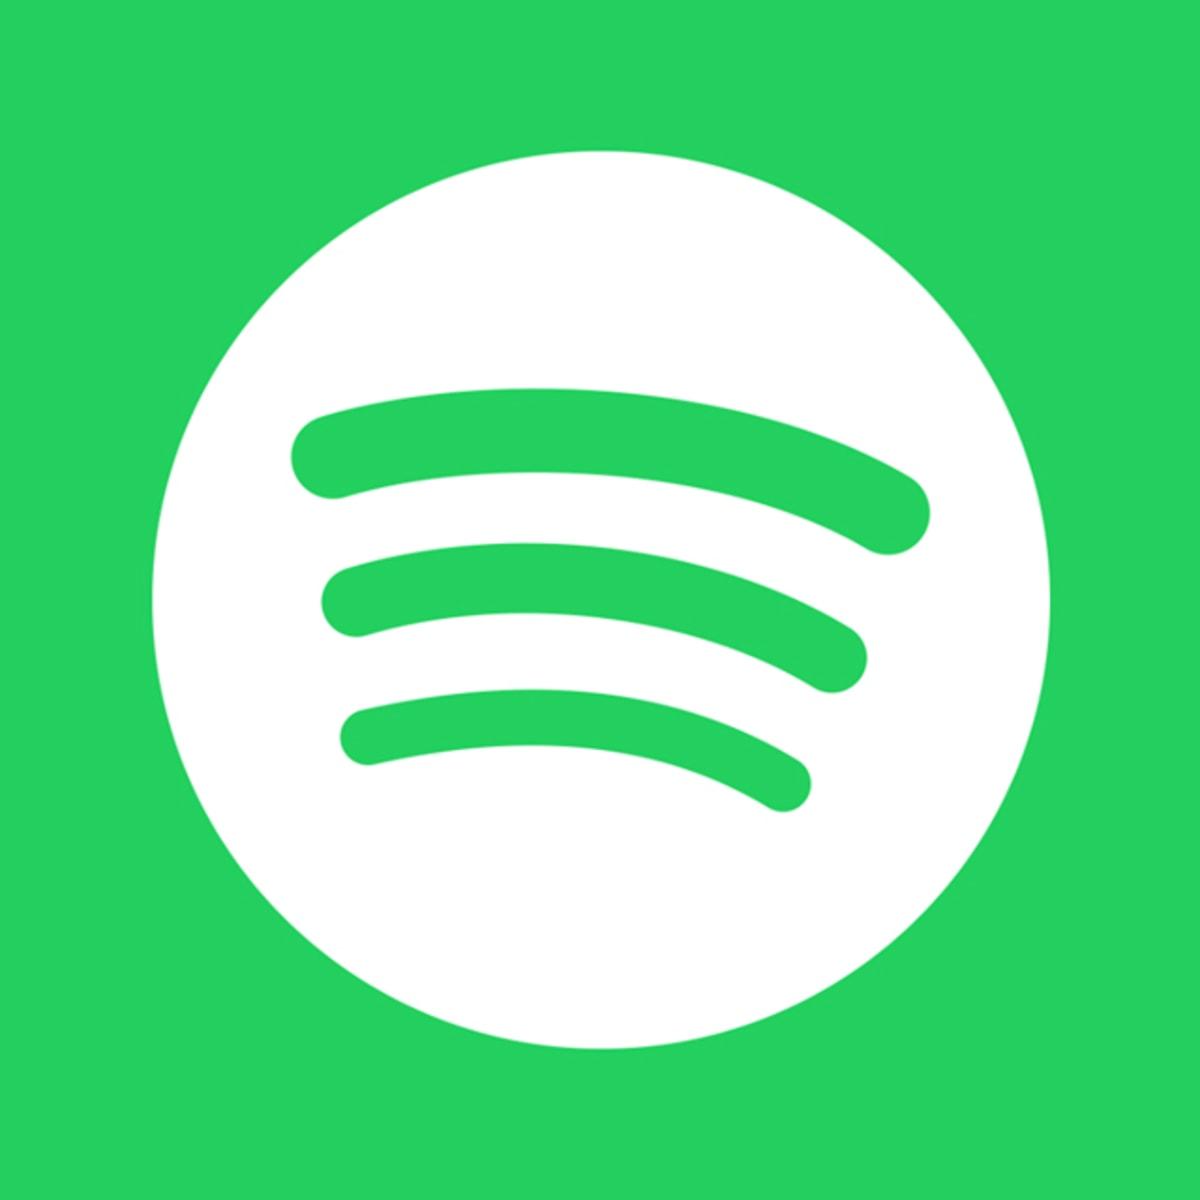 Spotify logo gif 4 » GIF Images Download